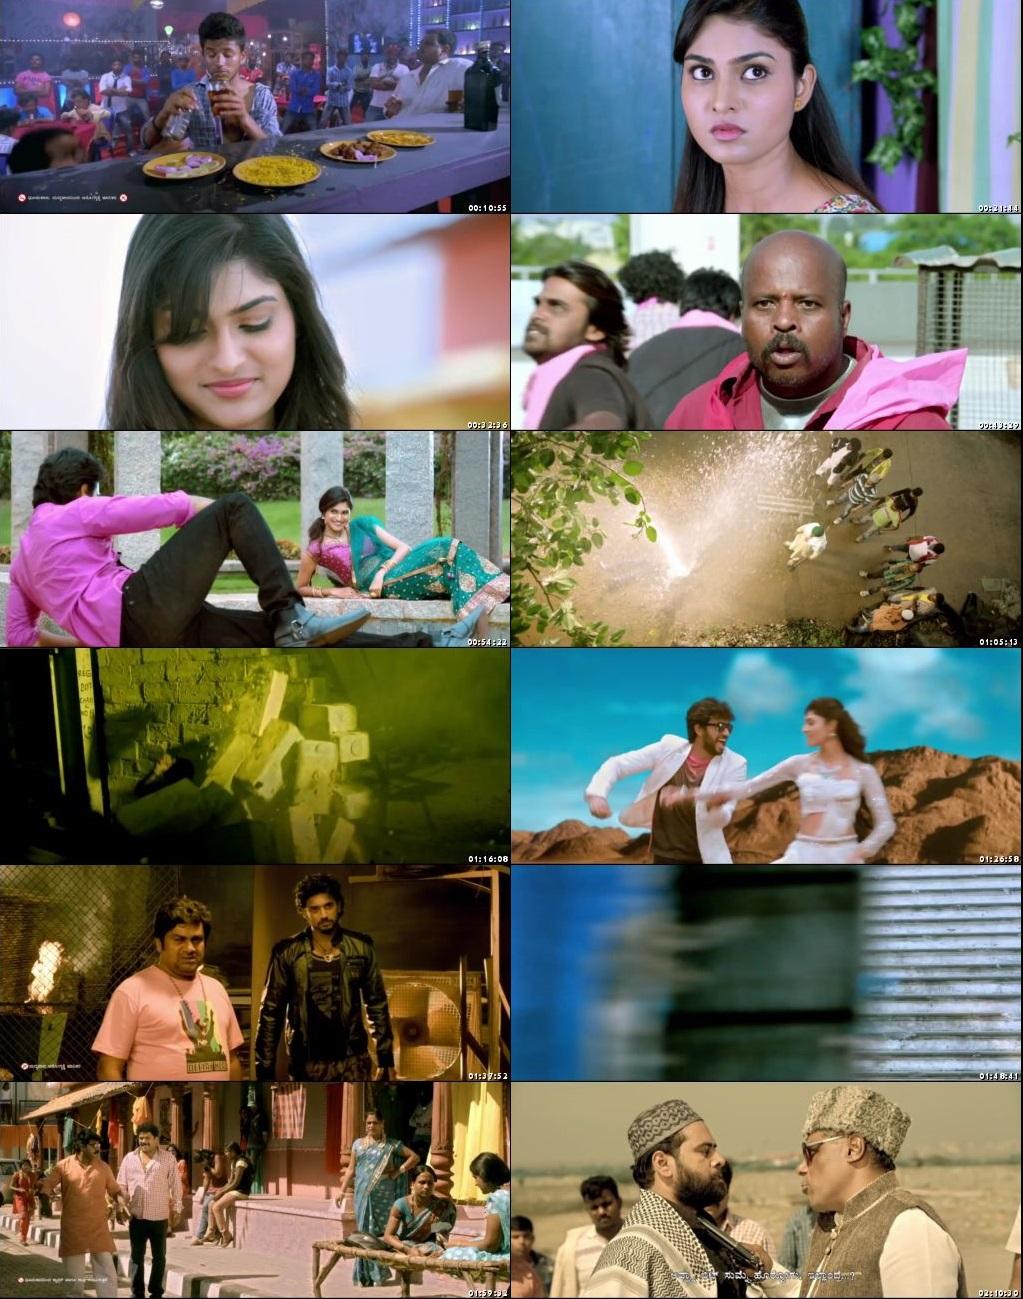 Mumbai 2017 latest movies free download, Mumbai 2017 hd movies download, Mumbai 2017 new movie download,Mumbai 2017 download free movies online, Mumbai 2017 hd movies free download